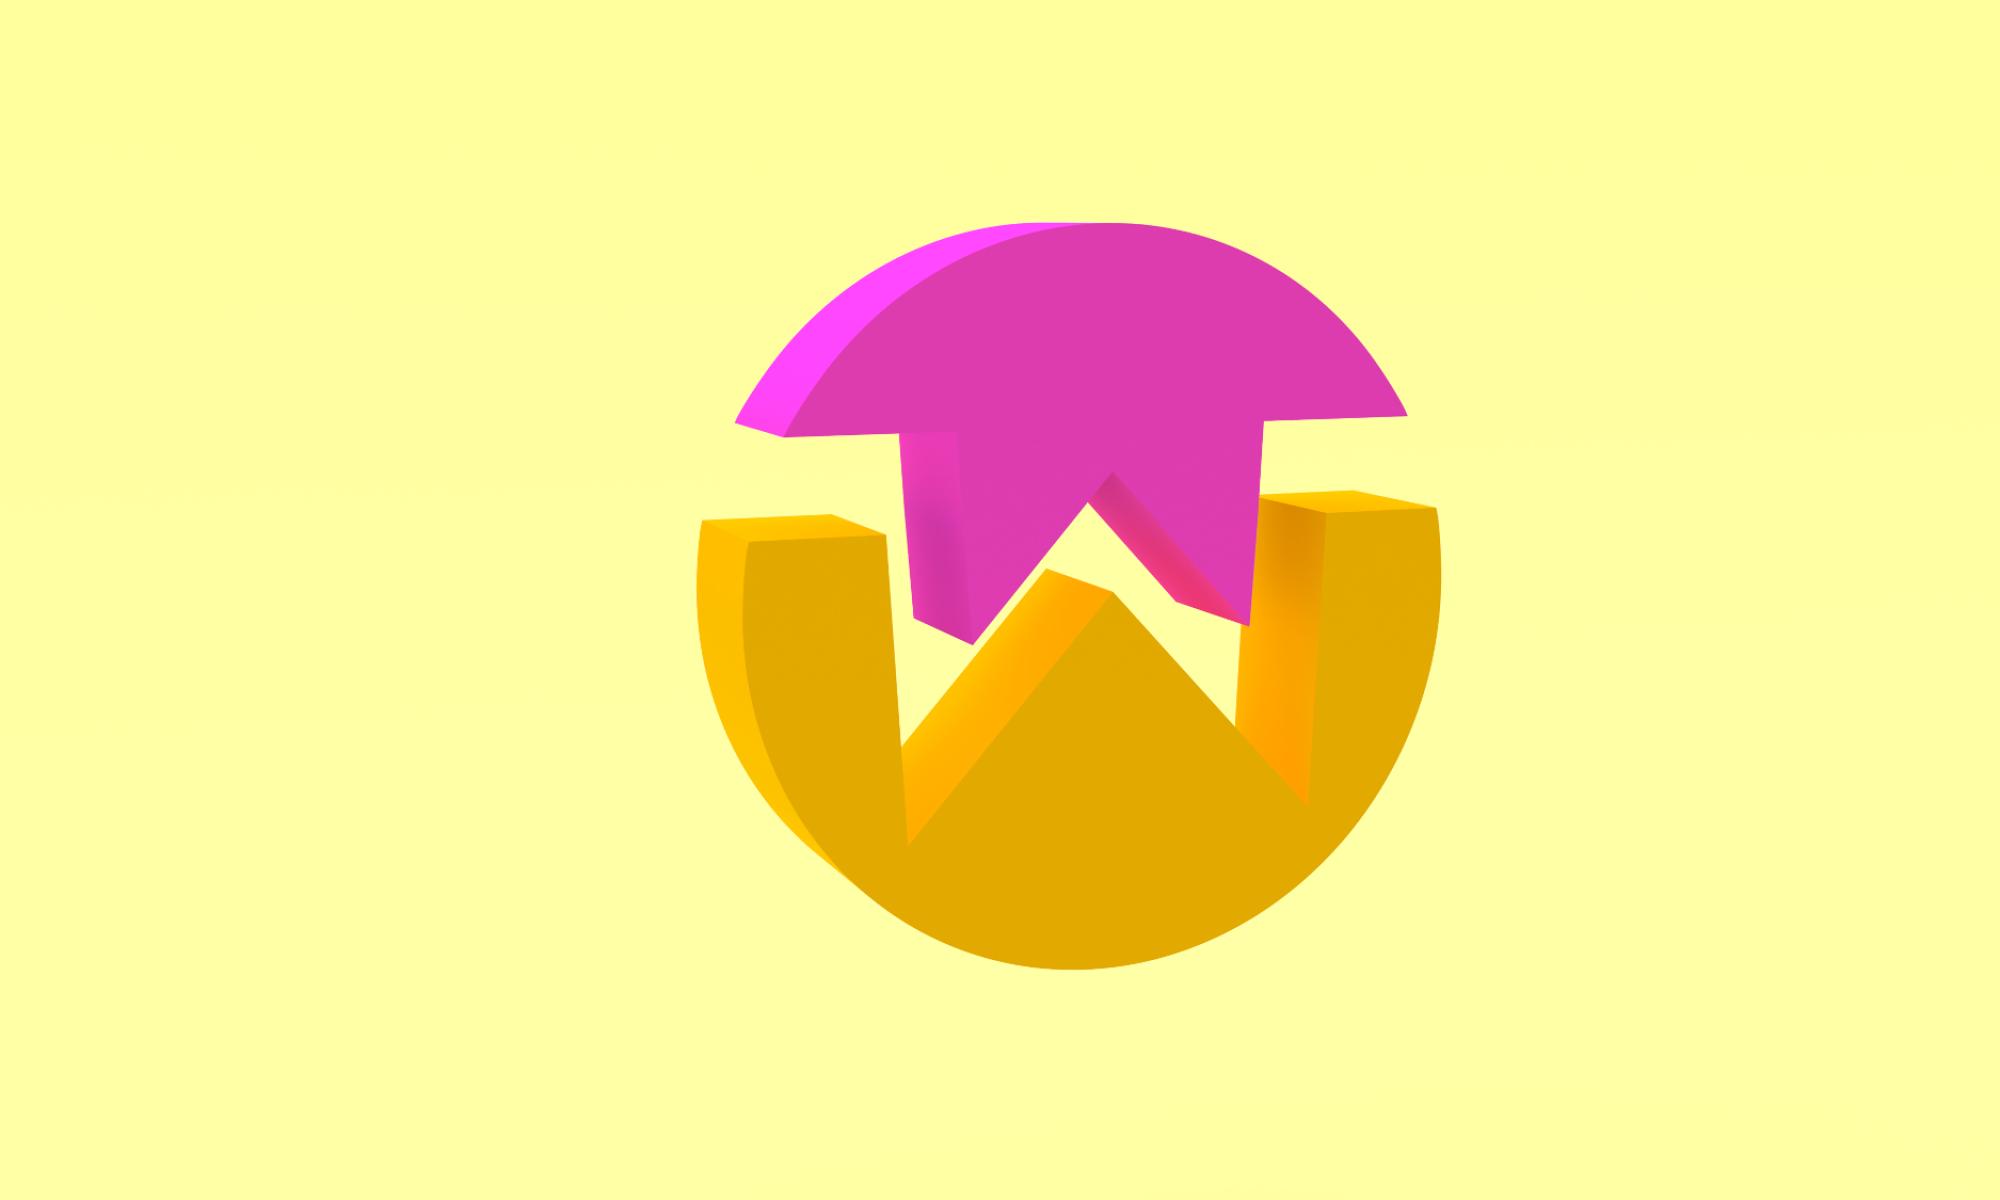 Wownero.com